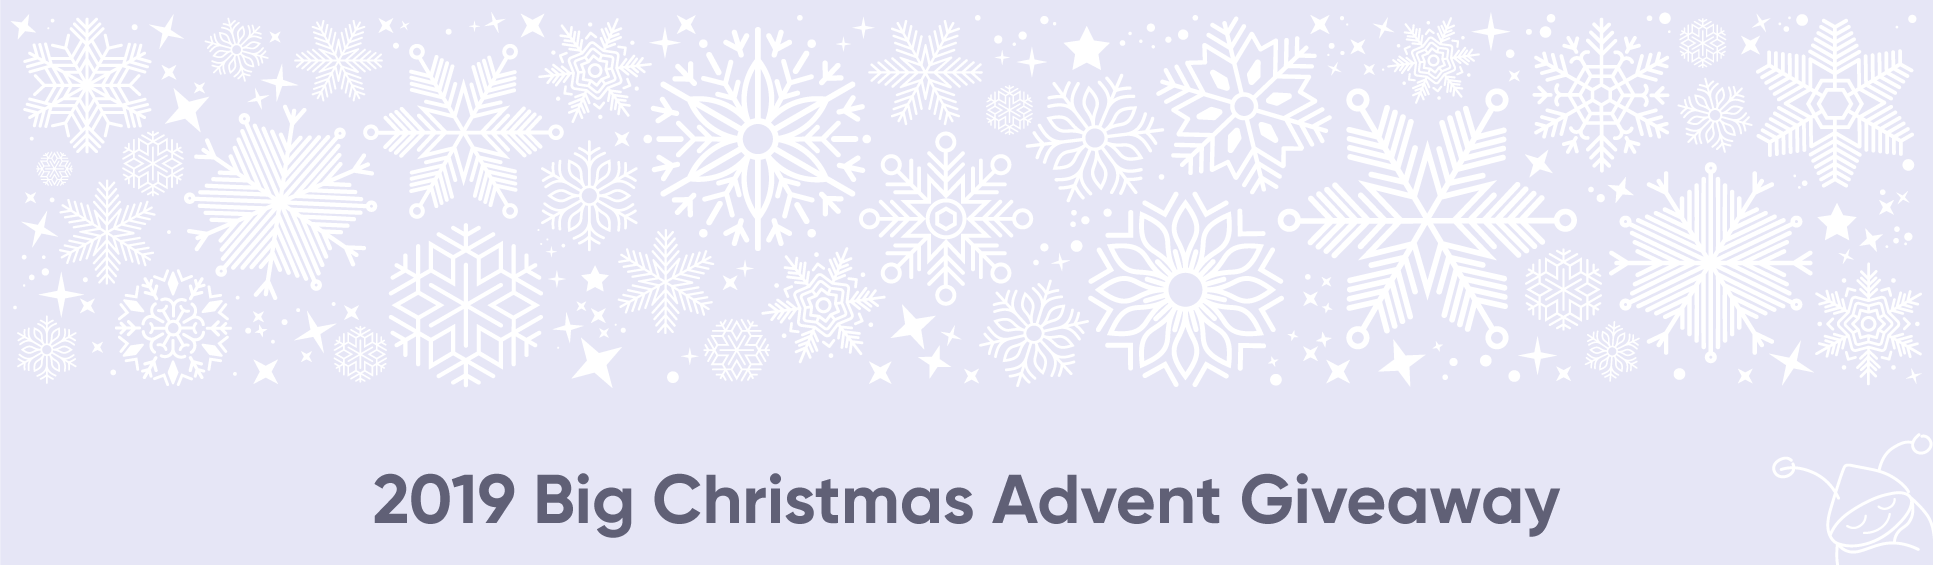 Morrck-Christmas-2019-banner-wide